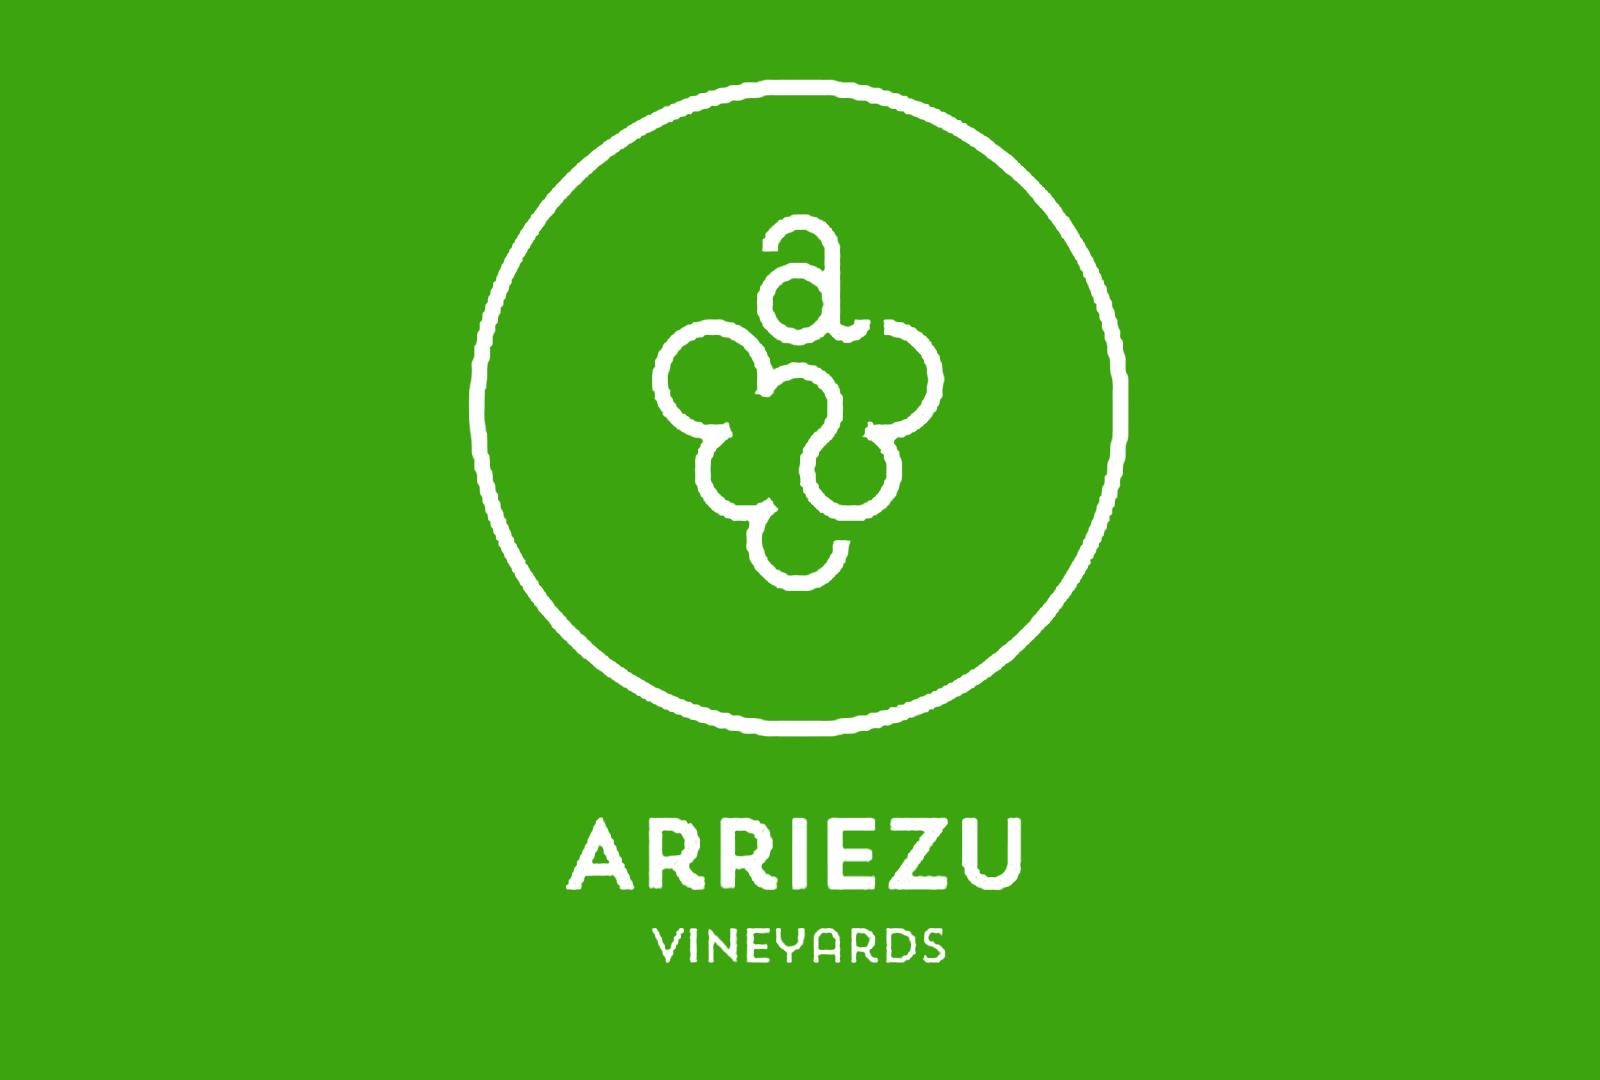 La bodega Arriezu Vineyards triunfa en Mundus Vini.